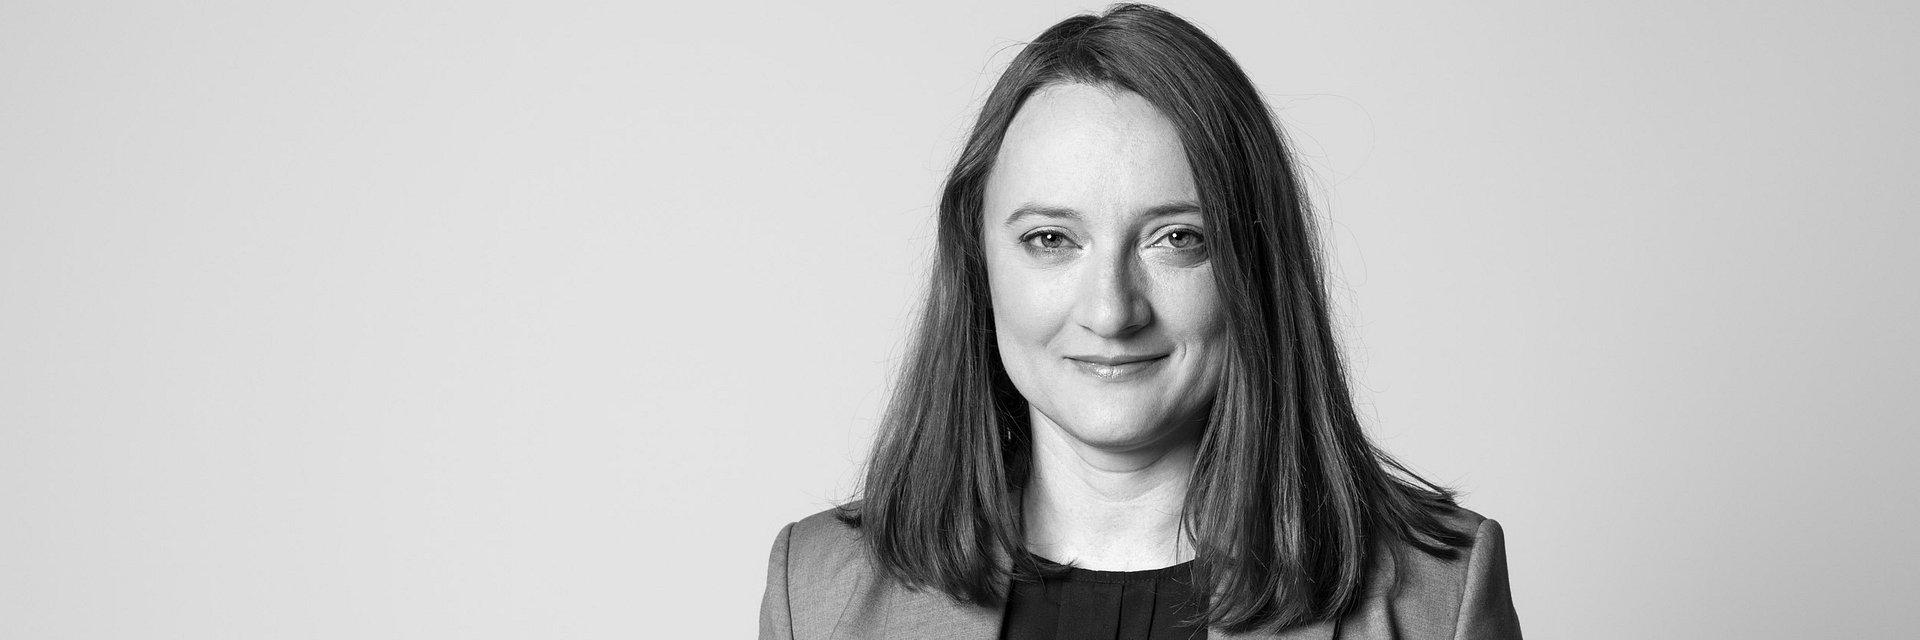 Anna Adamczyk Group Account Directorem w Carat Polska